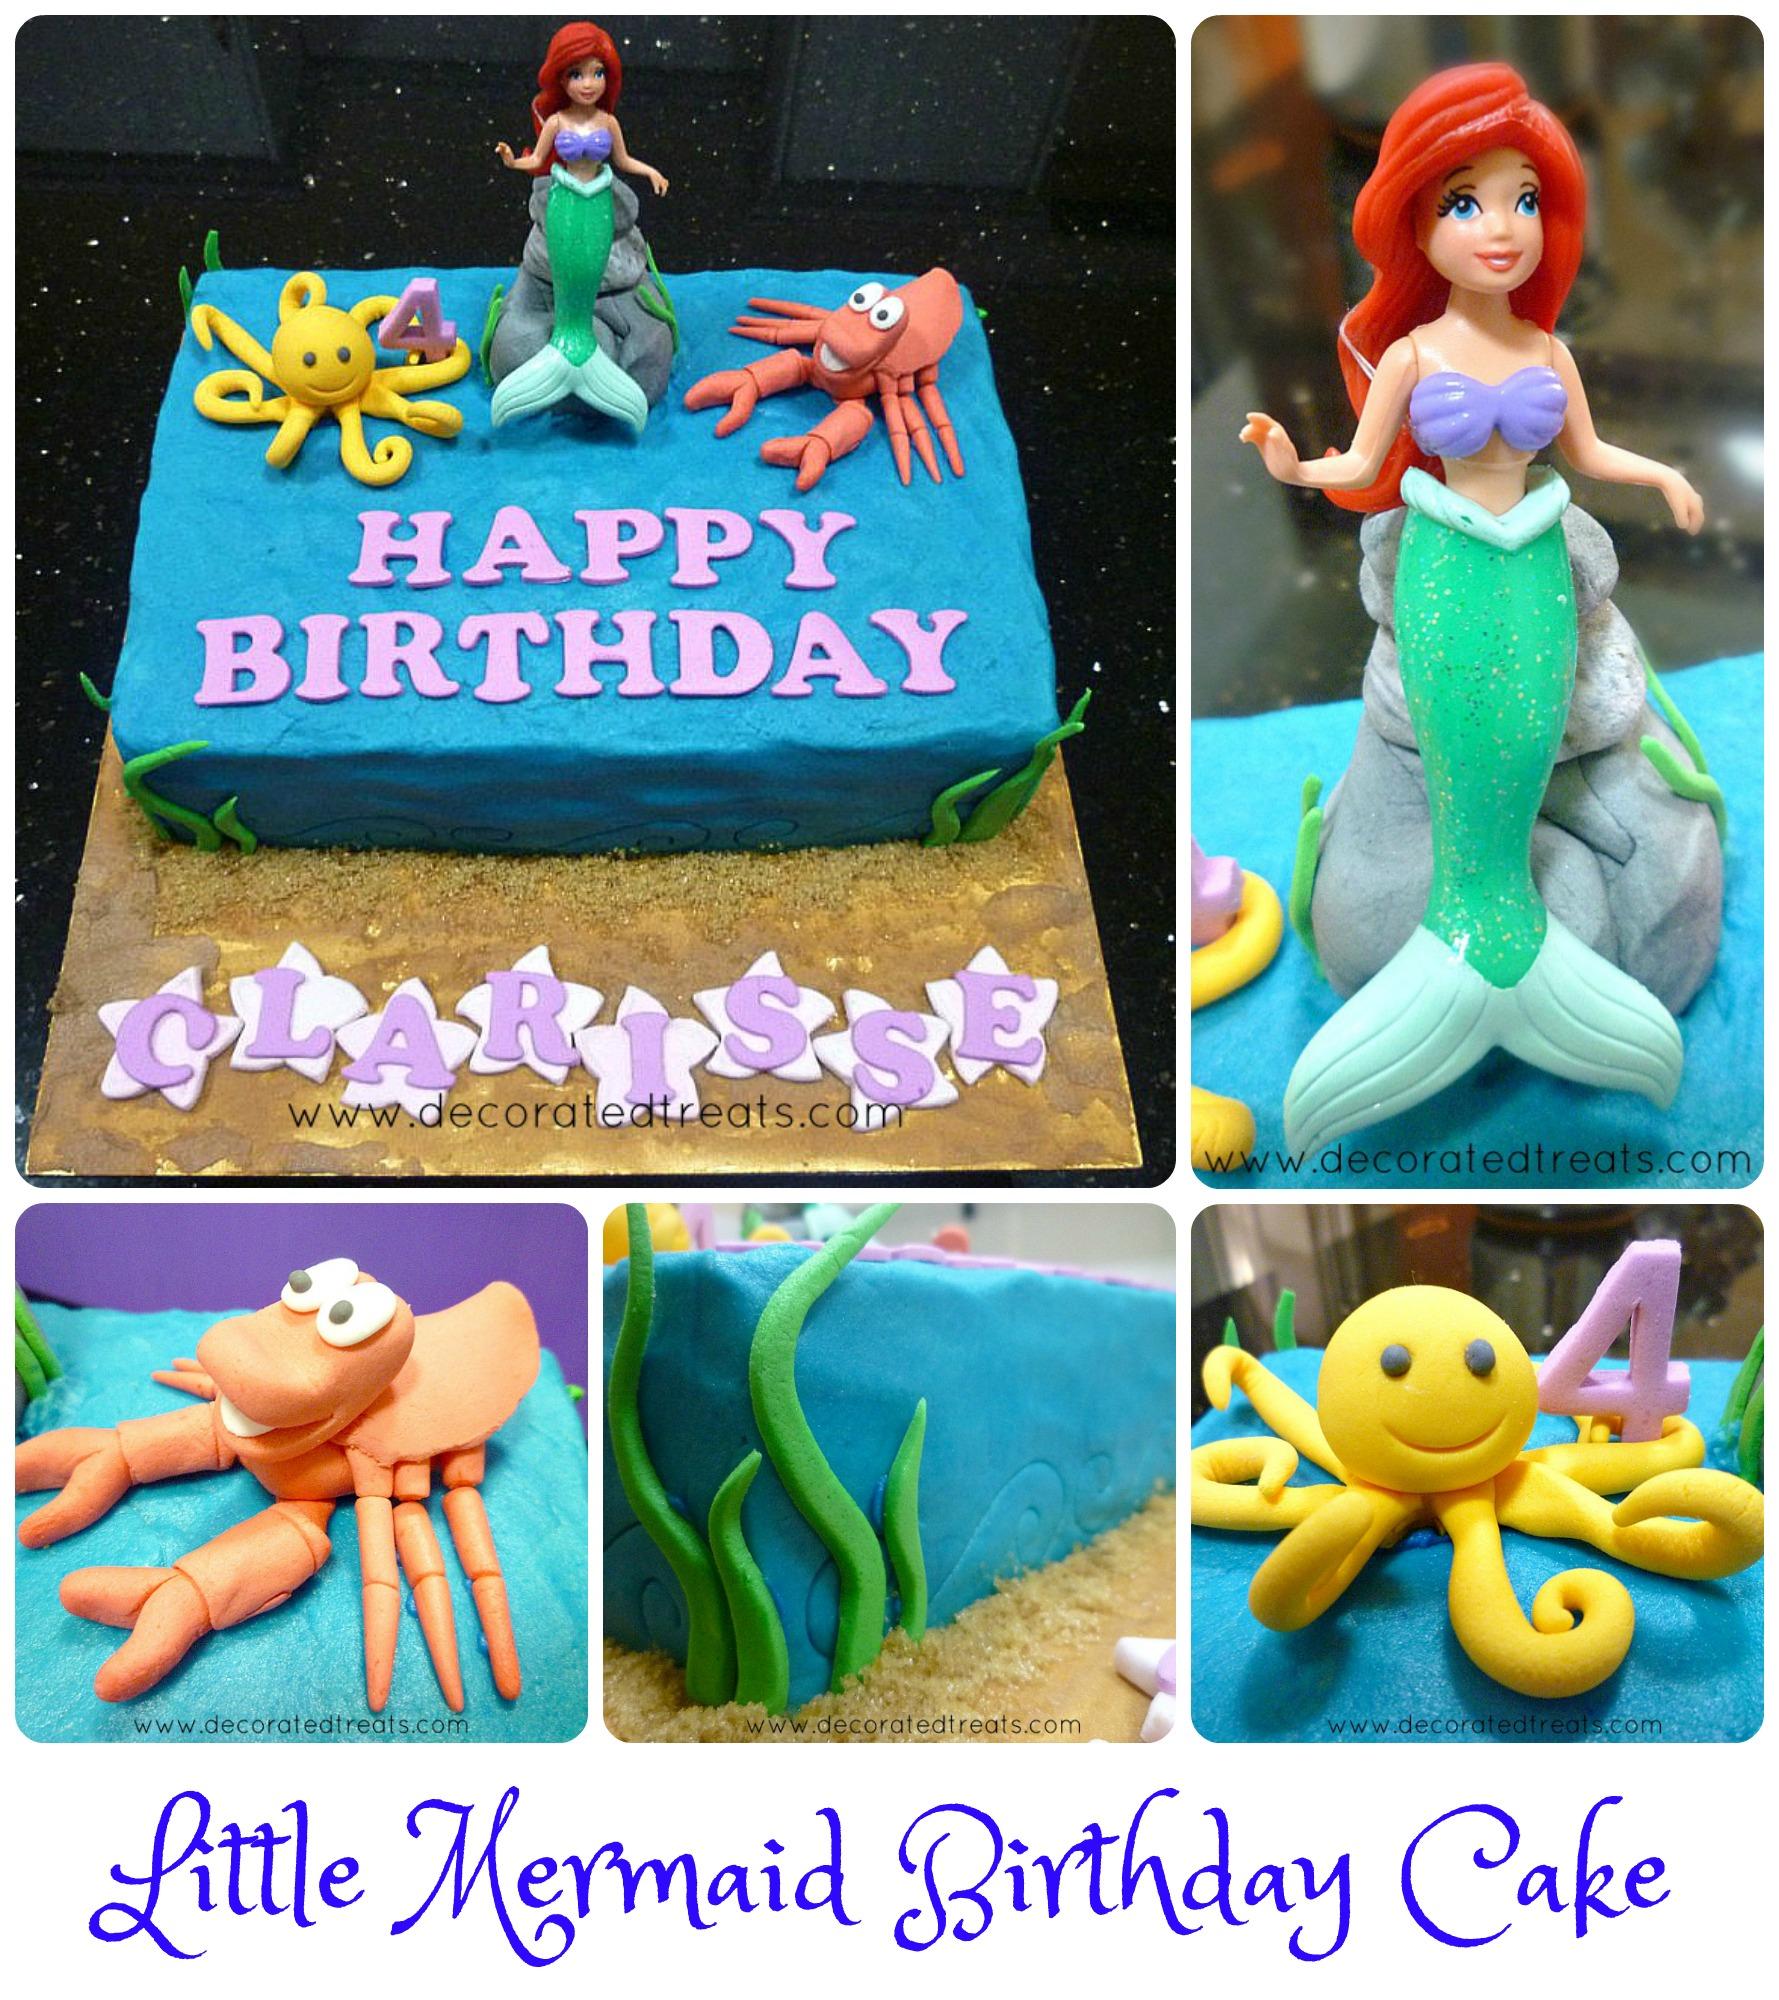 Poster for Ariel the Little Mermaid Birthday Cake